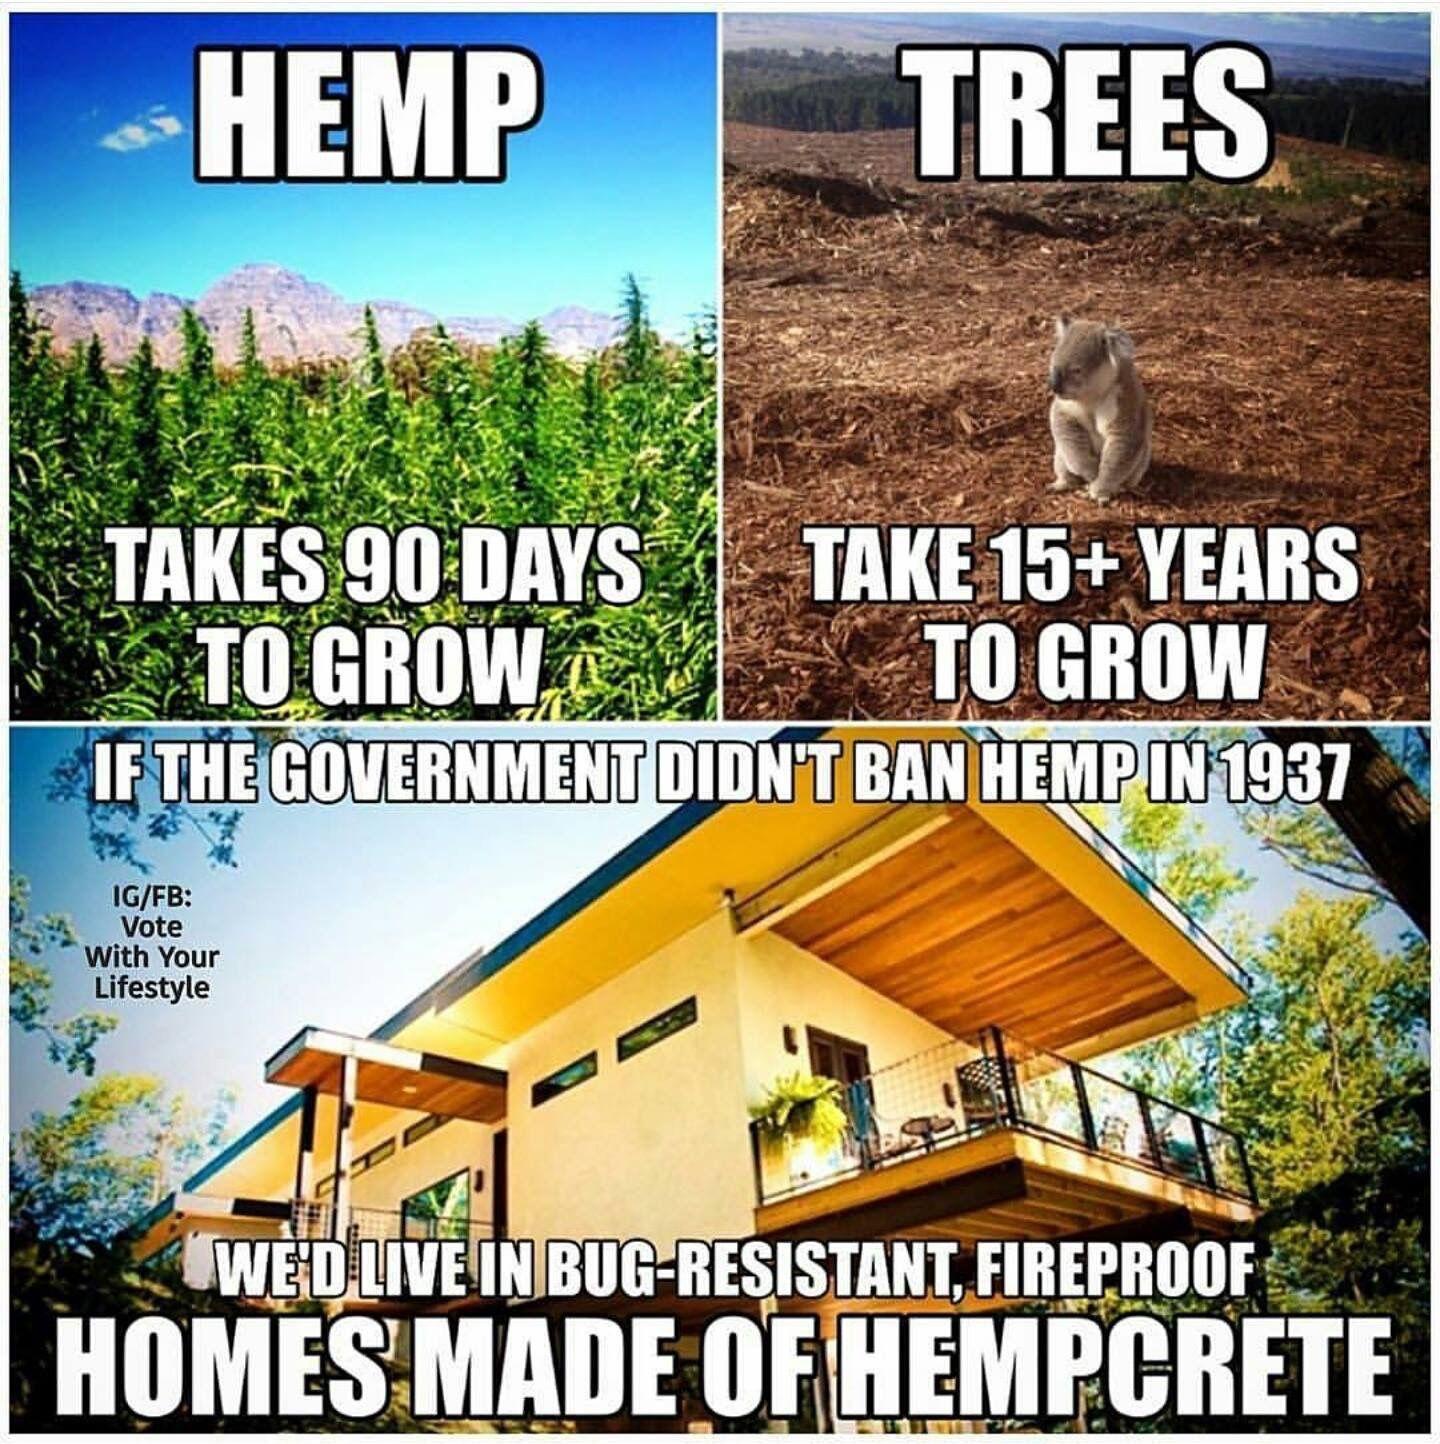 Hemp trees wood used for making houses and shelter. #hemp #cbd #cannabis #cbc #hempcrete #growhemp #trees #sciencehistory